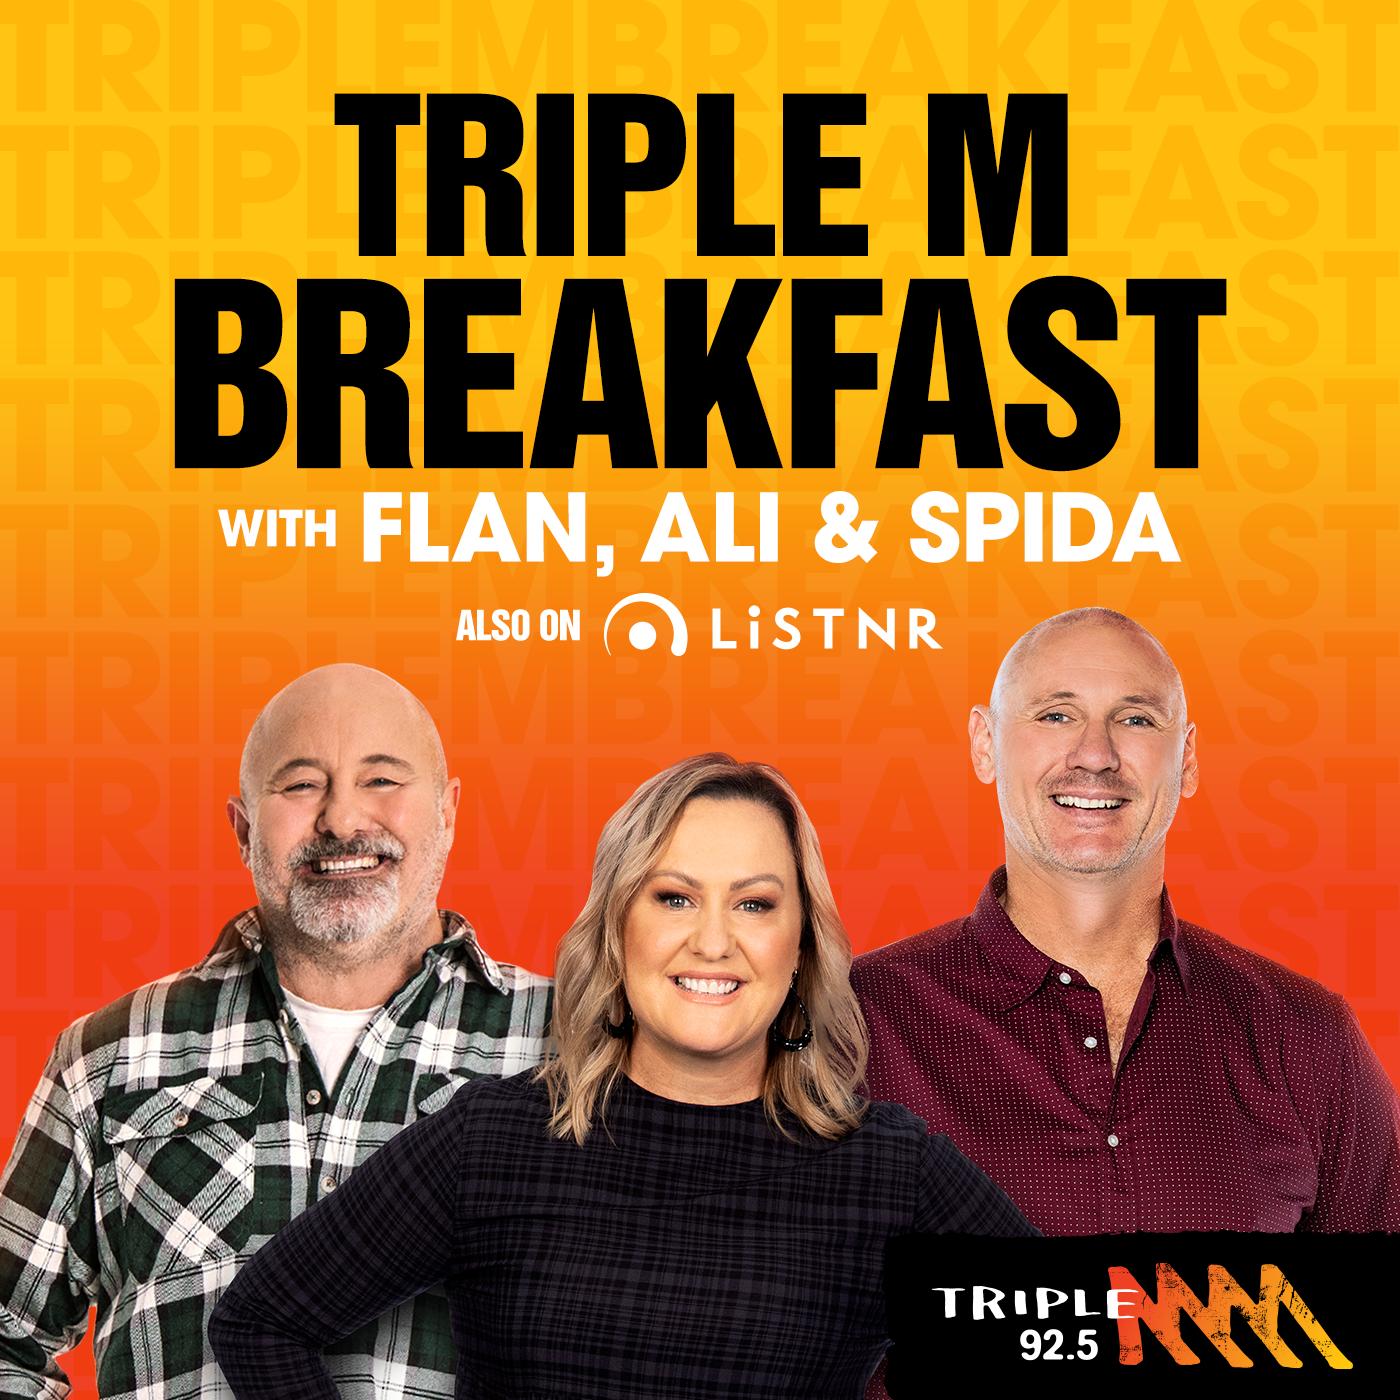 AJ, Bridge and Spida - Gold FM 92.5 Gold Coast